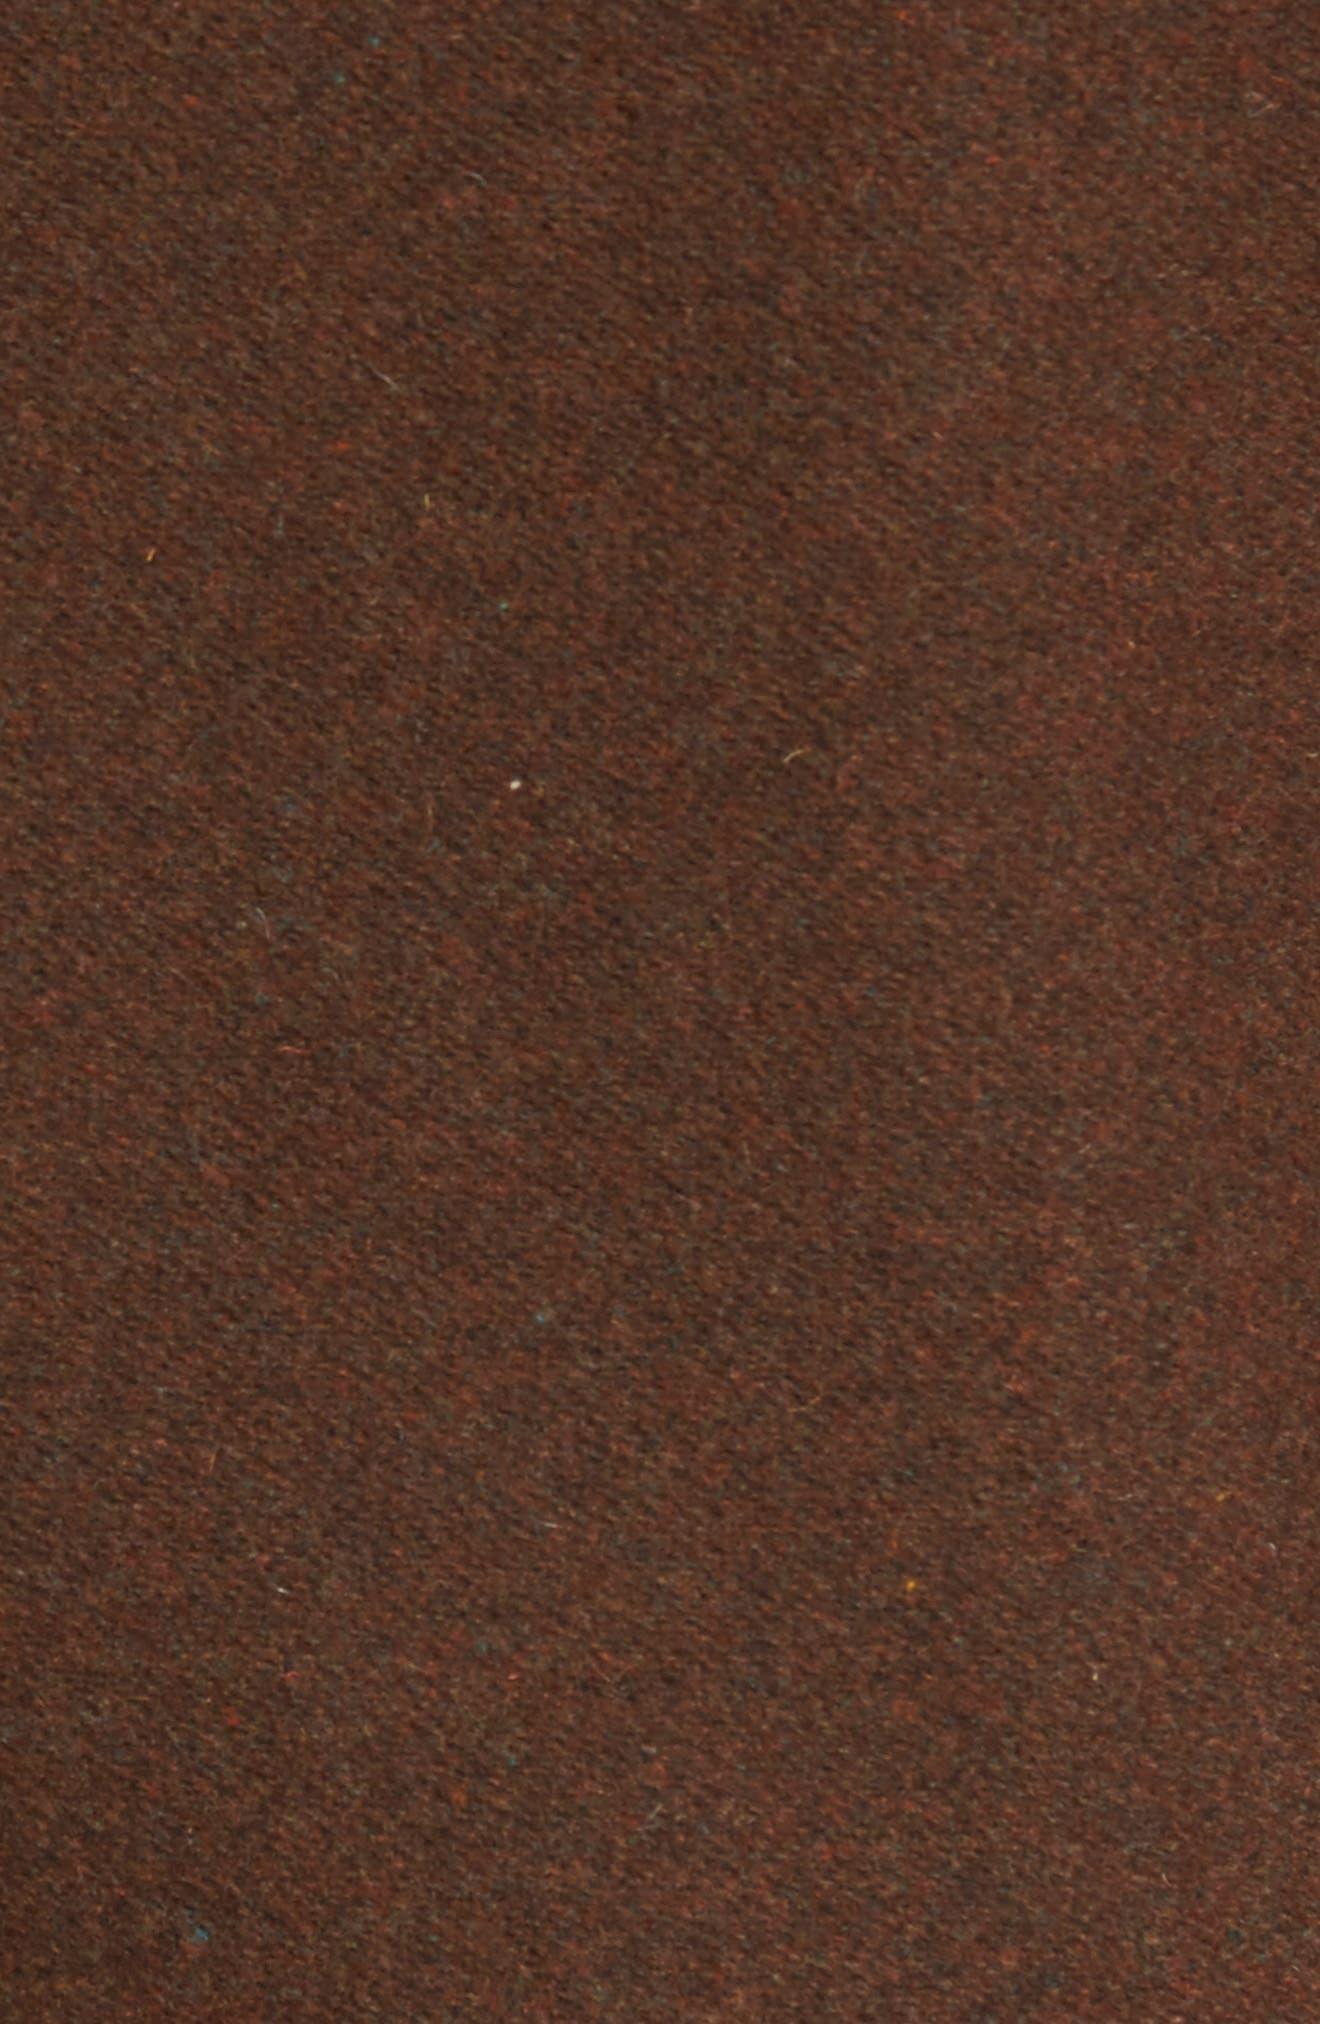 Liberty Wool Blend Zip Front Jacket,                             Alternate thumbnail 6, color,